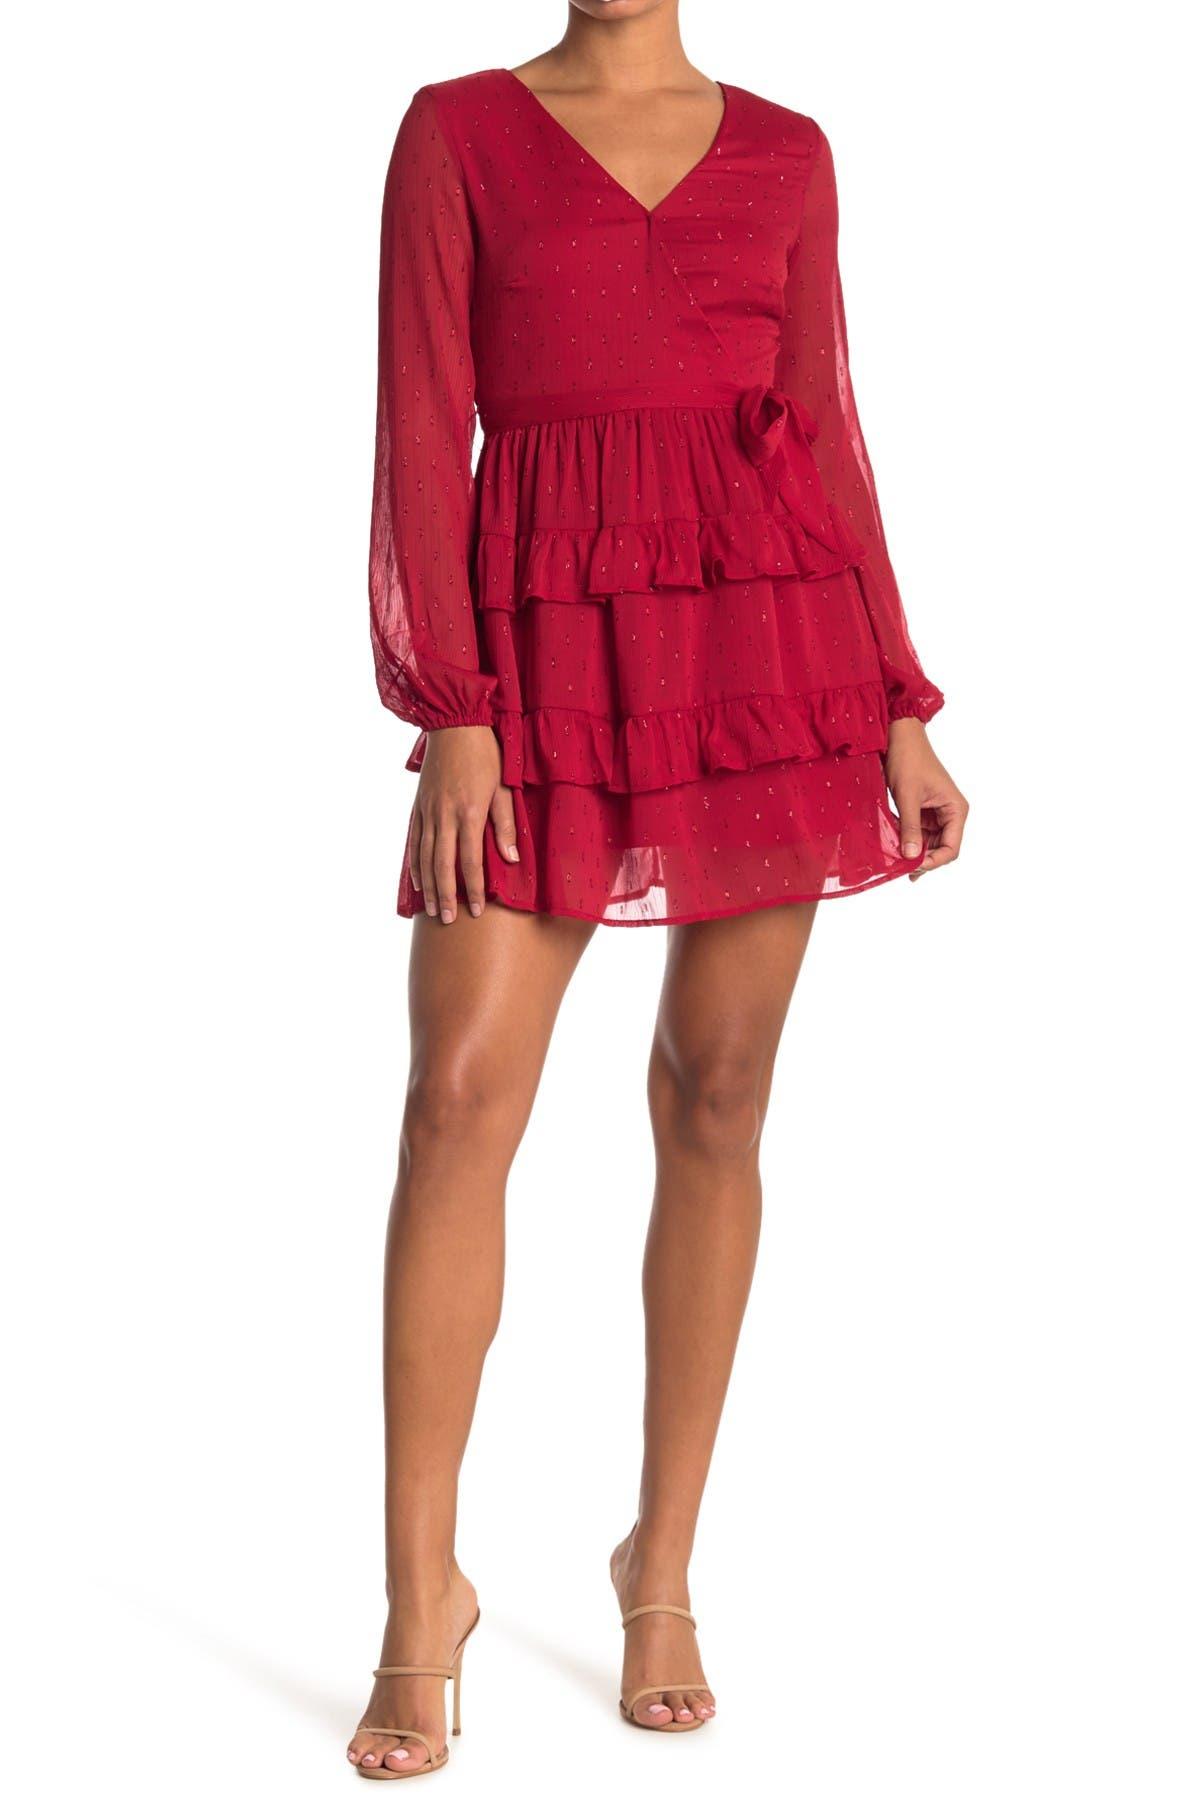 Image of Love, Fire Tiered Mini Dress